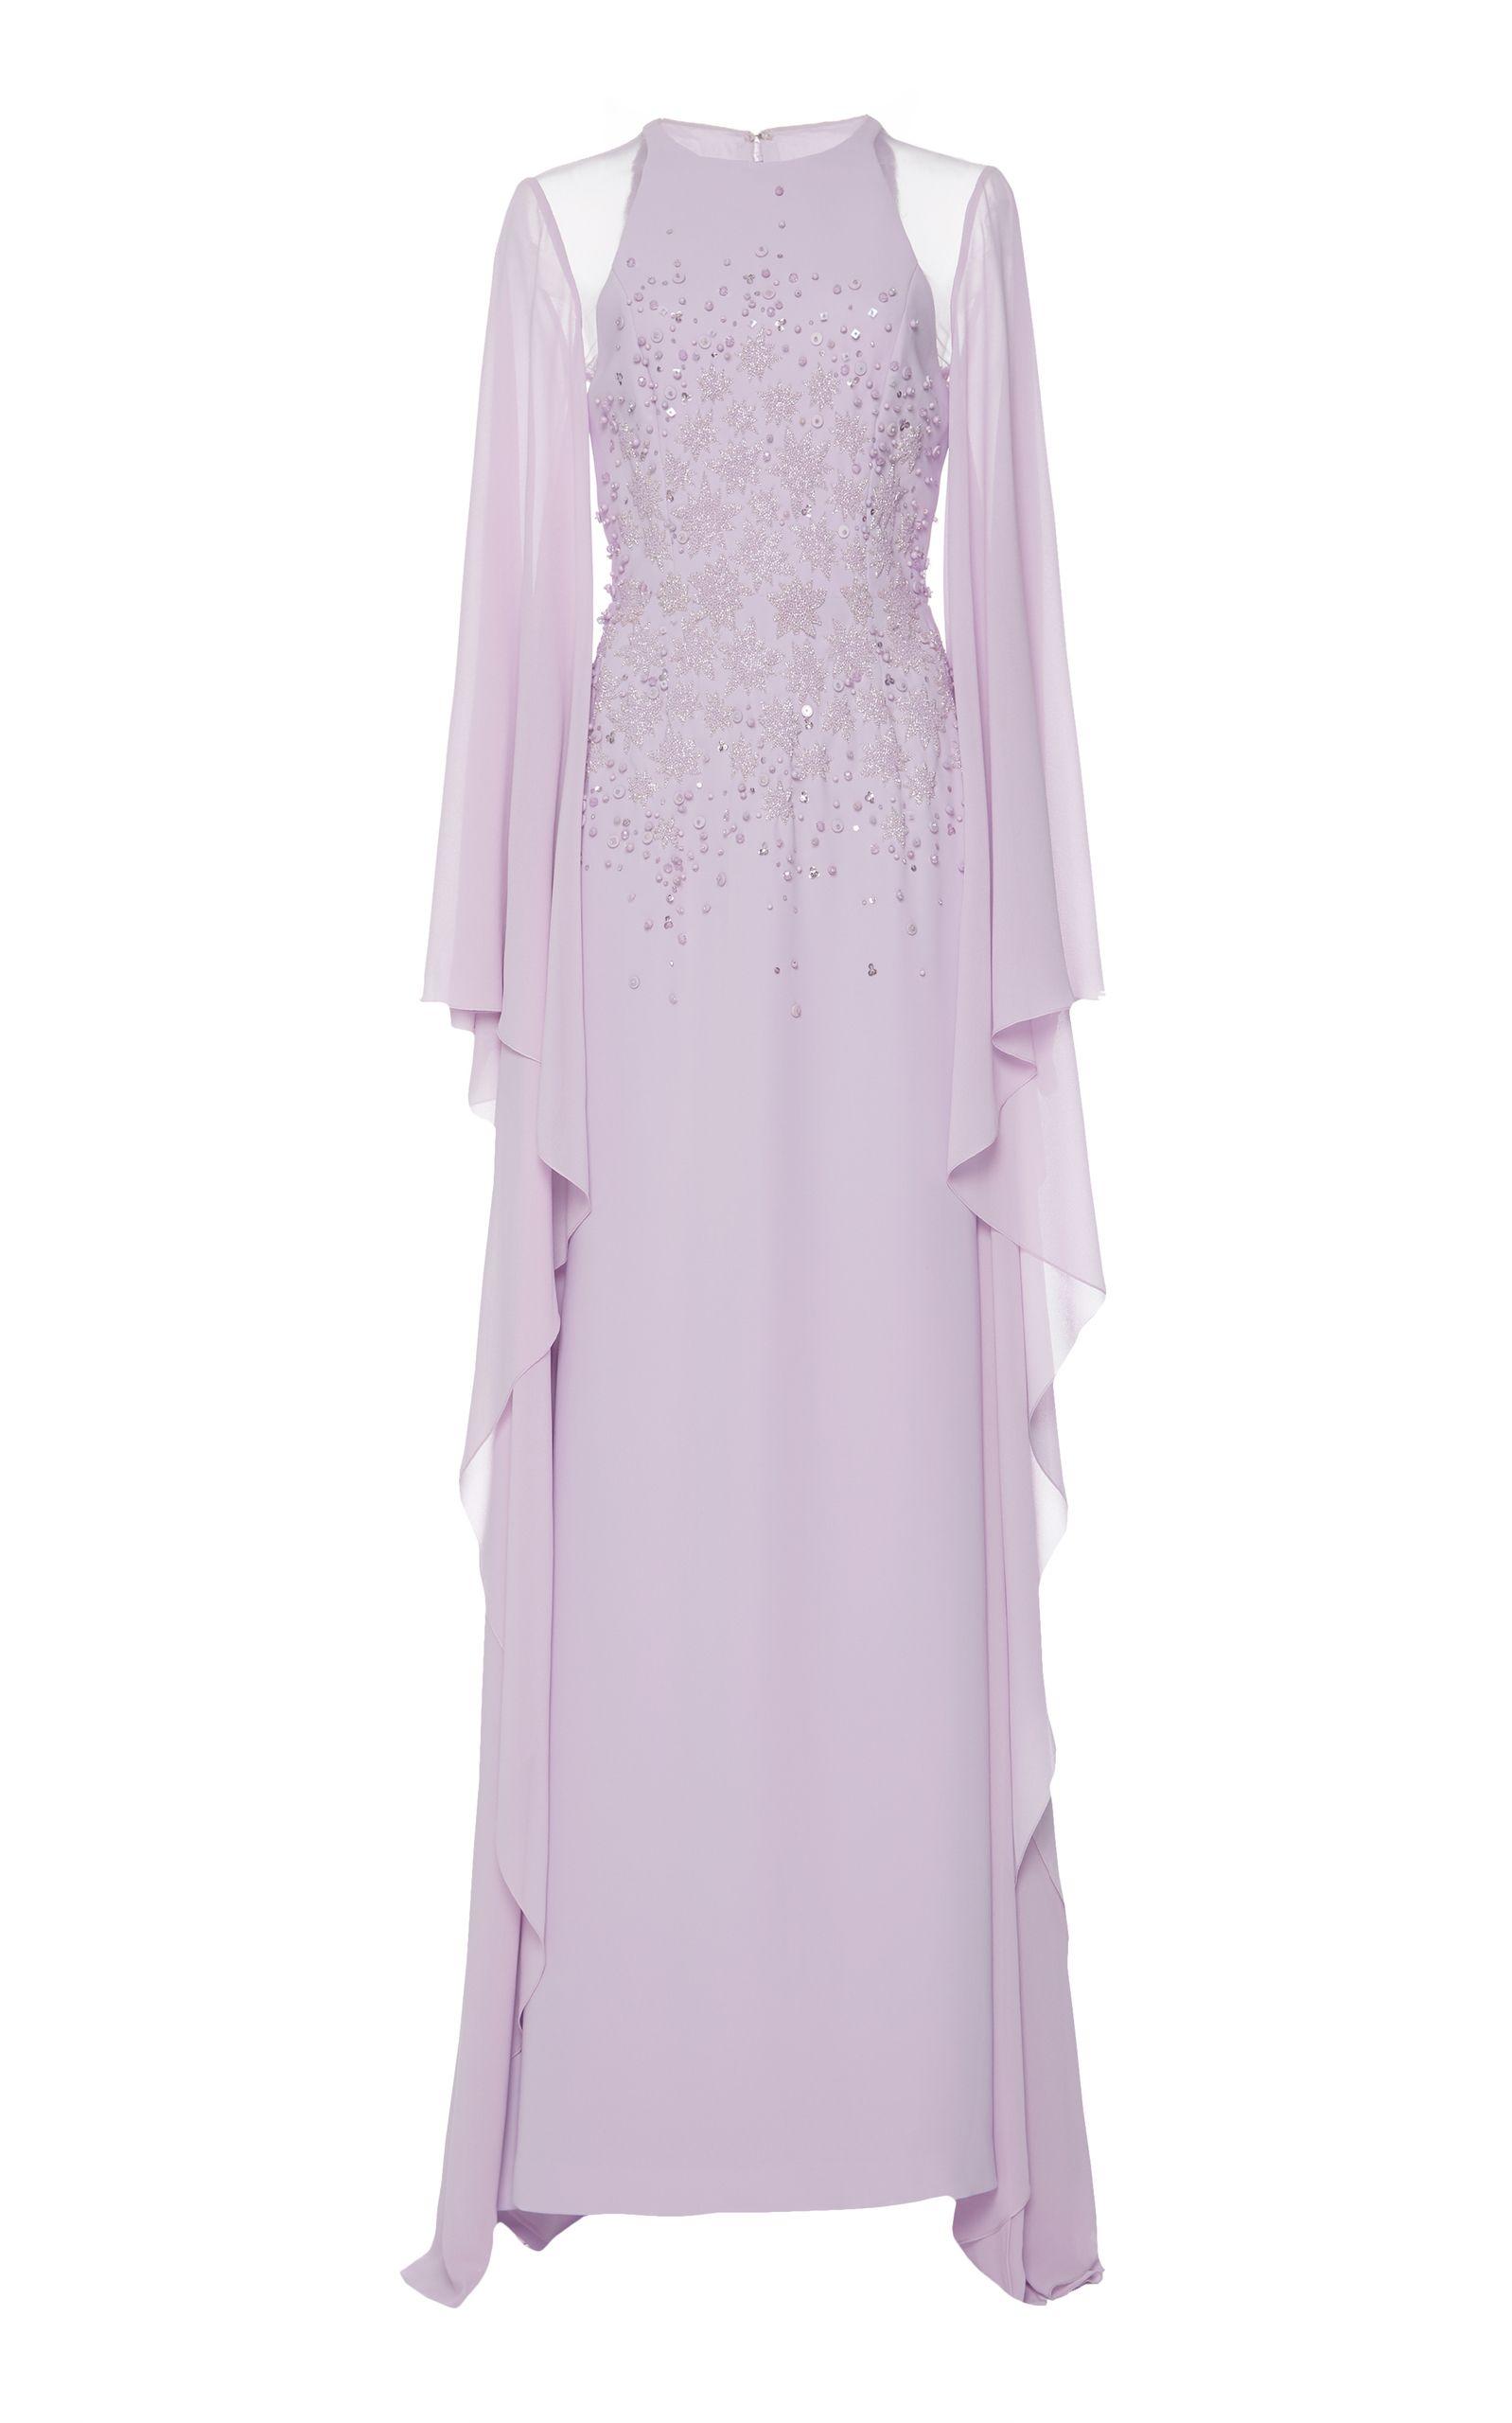 Georges Hobeika Bead Embellished Gown